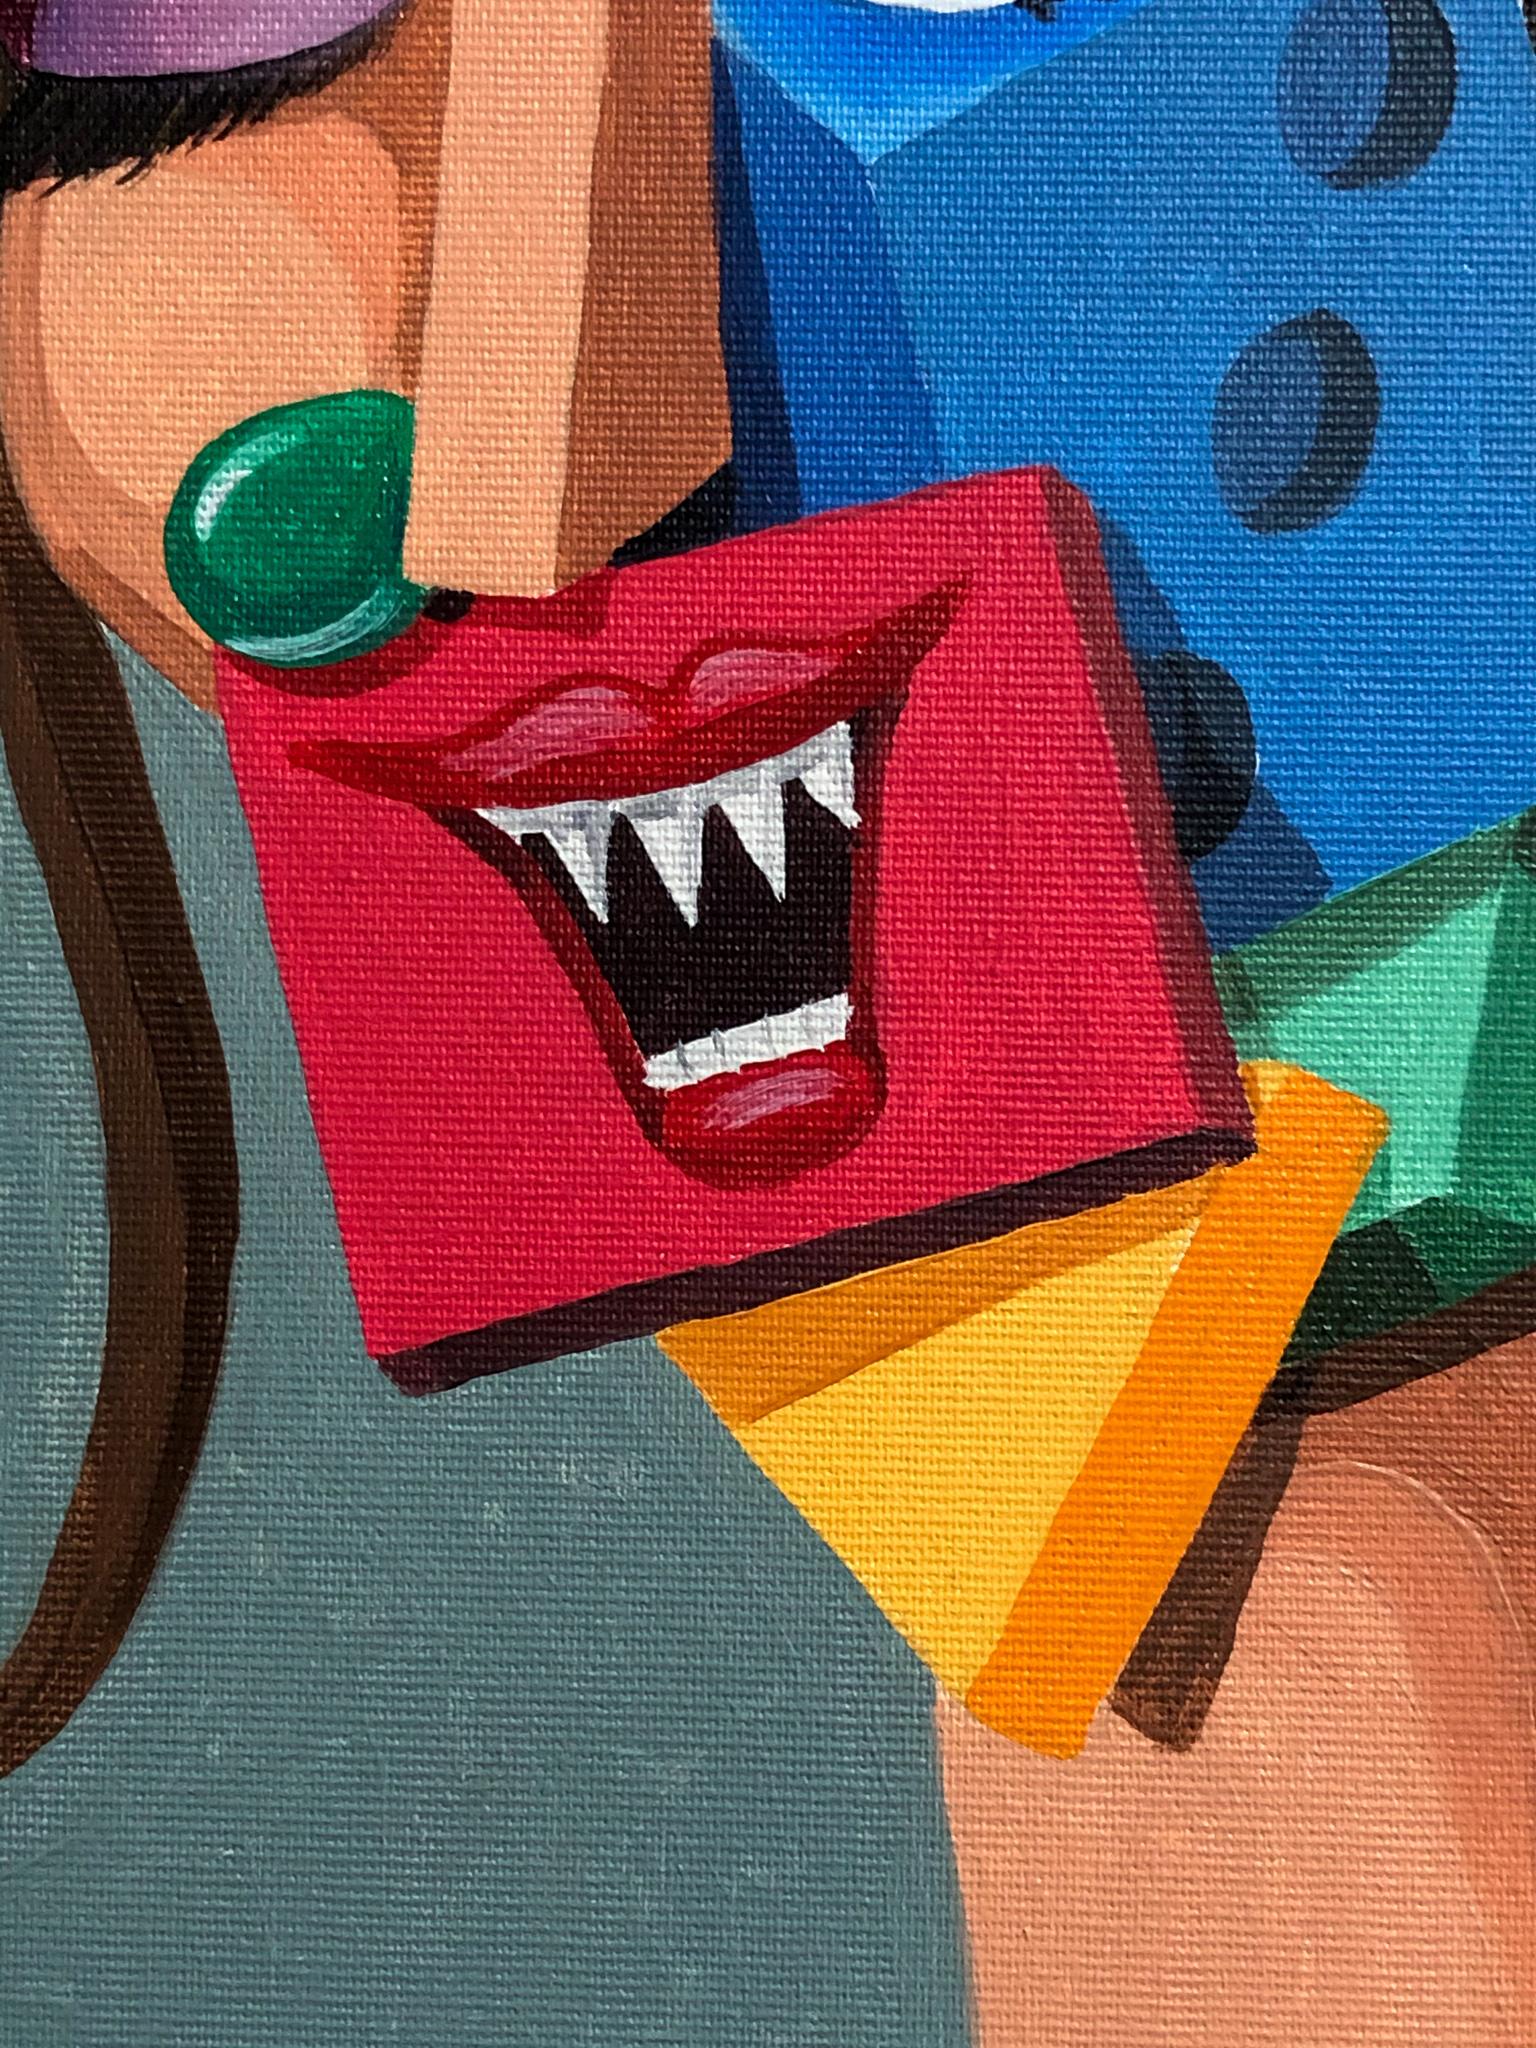 Frau mit Karotte Detail 01